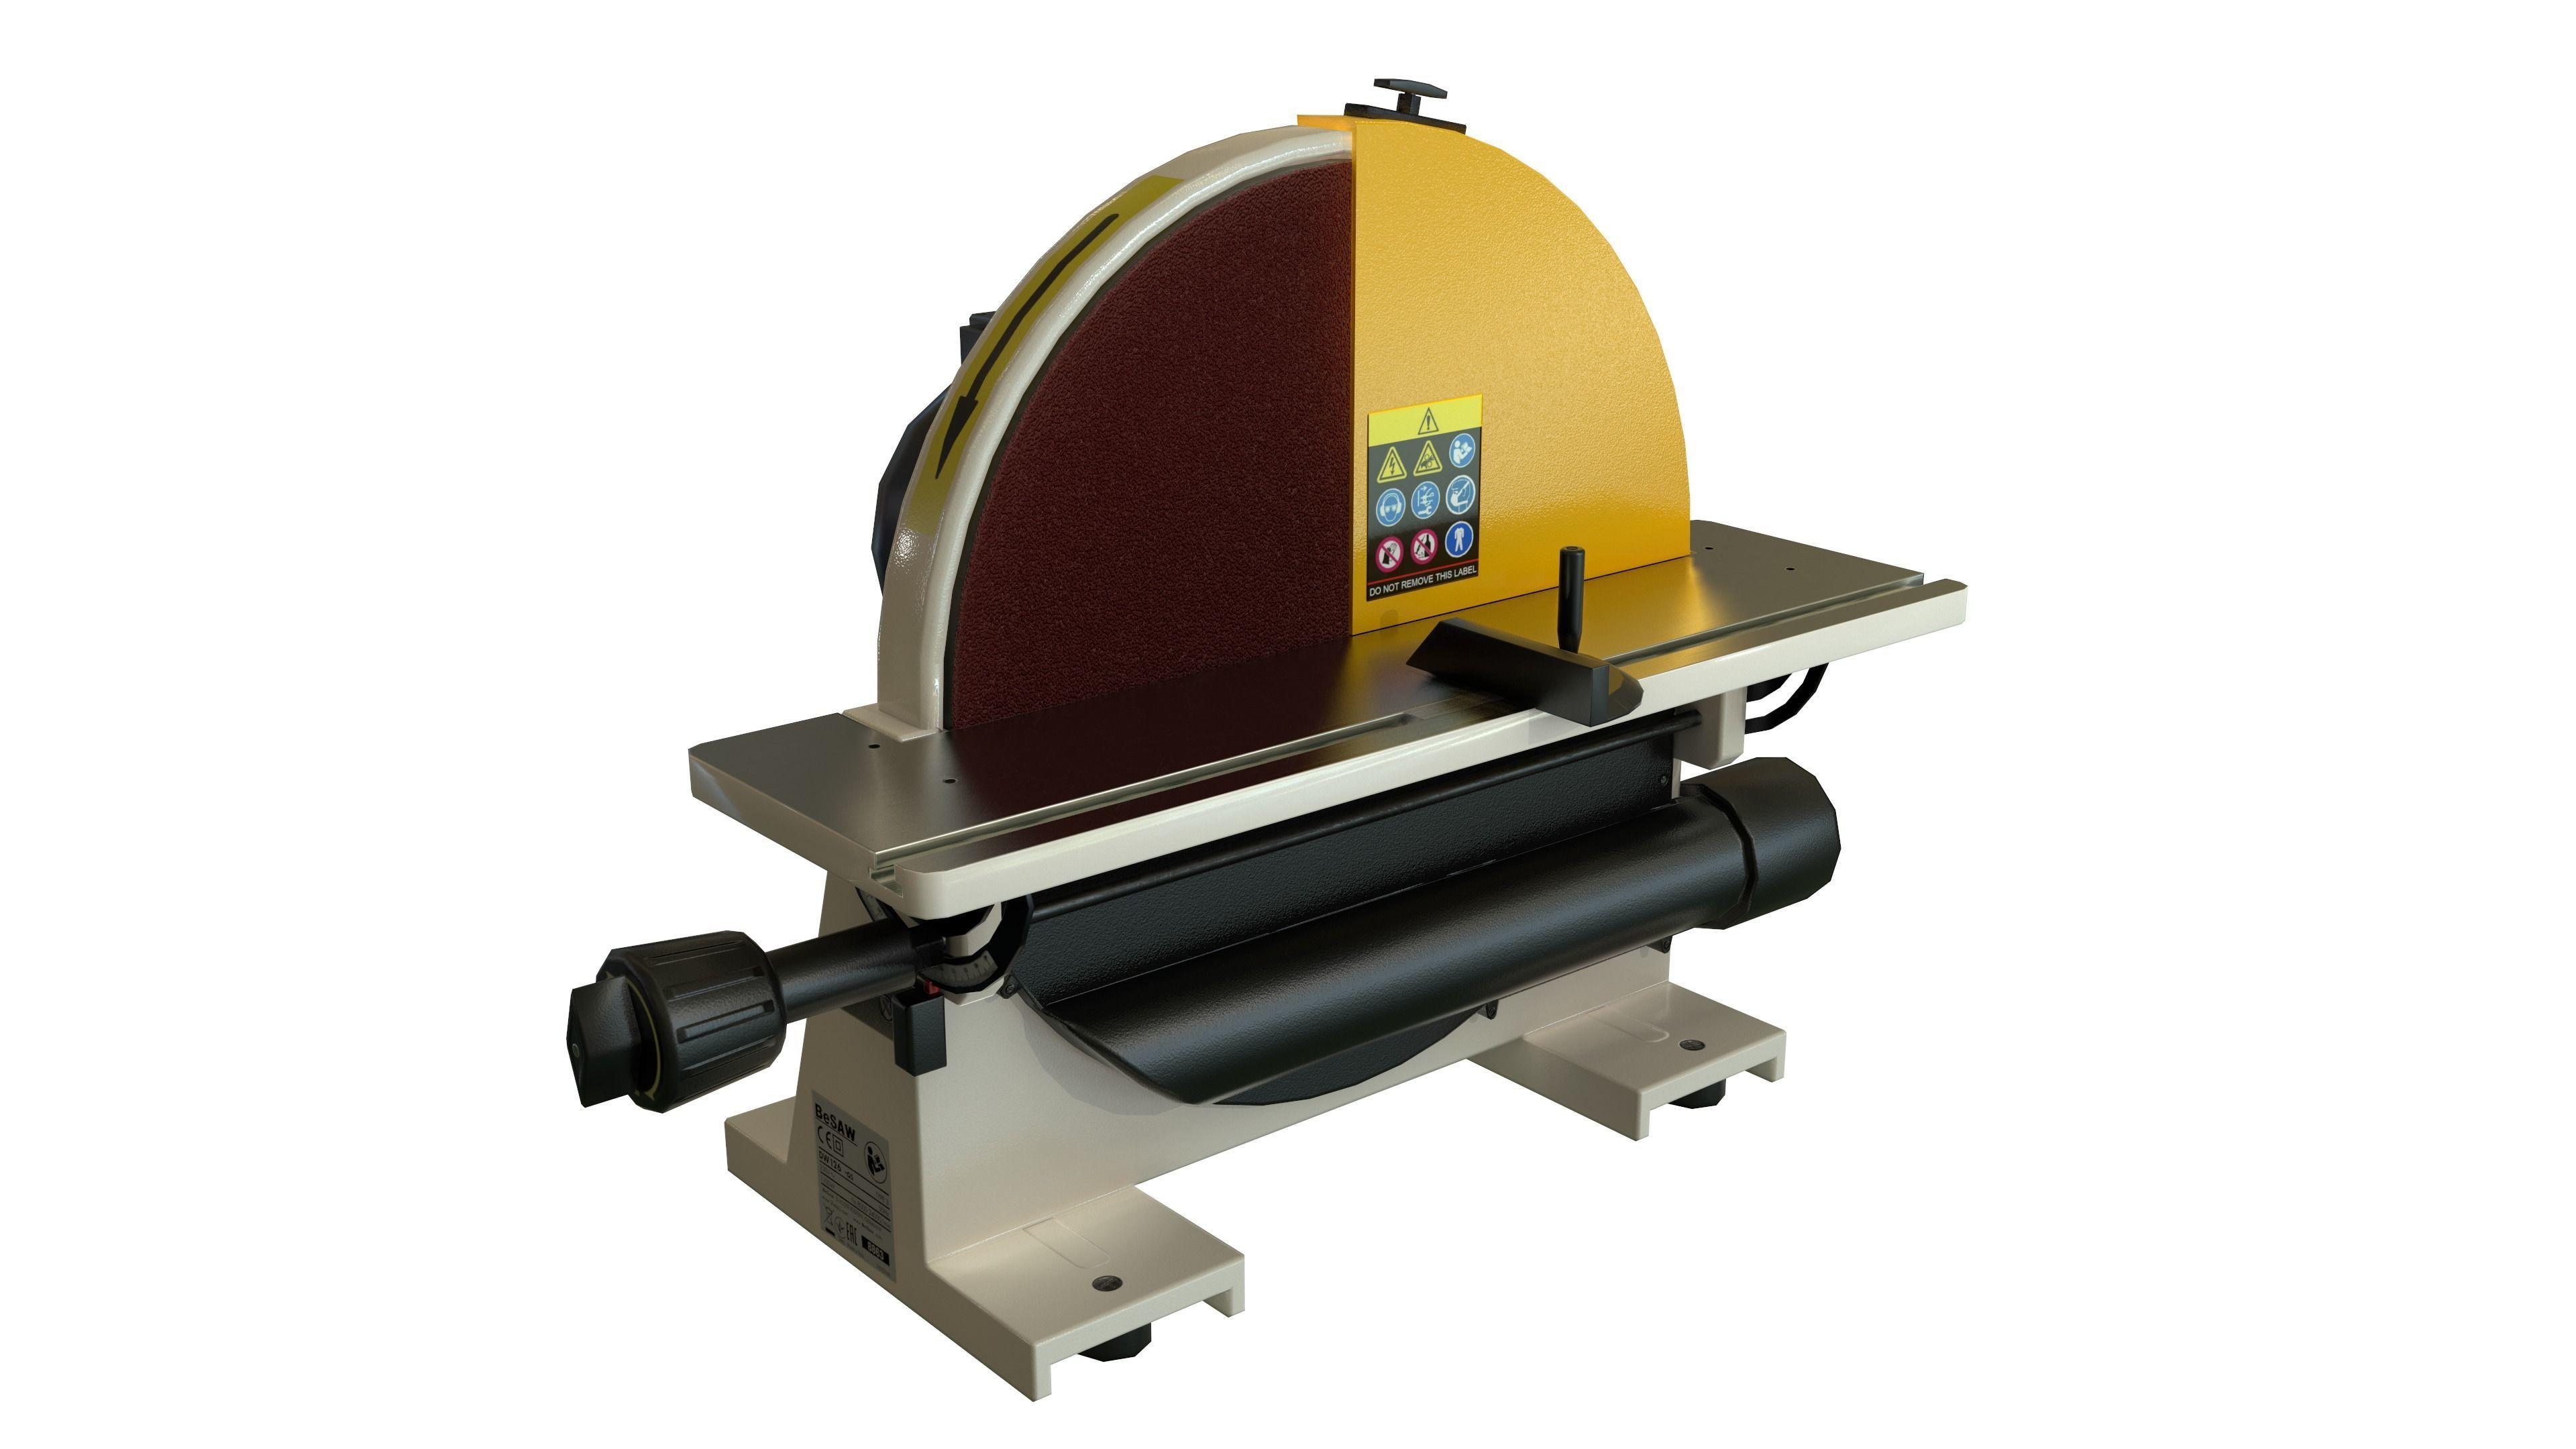 Disk sander Grind abrasive machine Clean